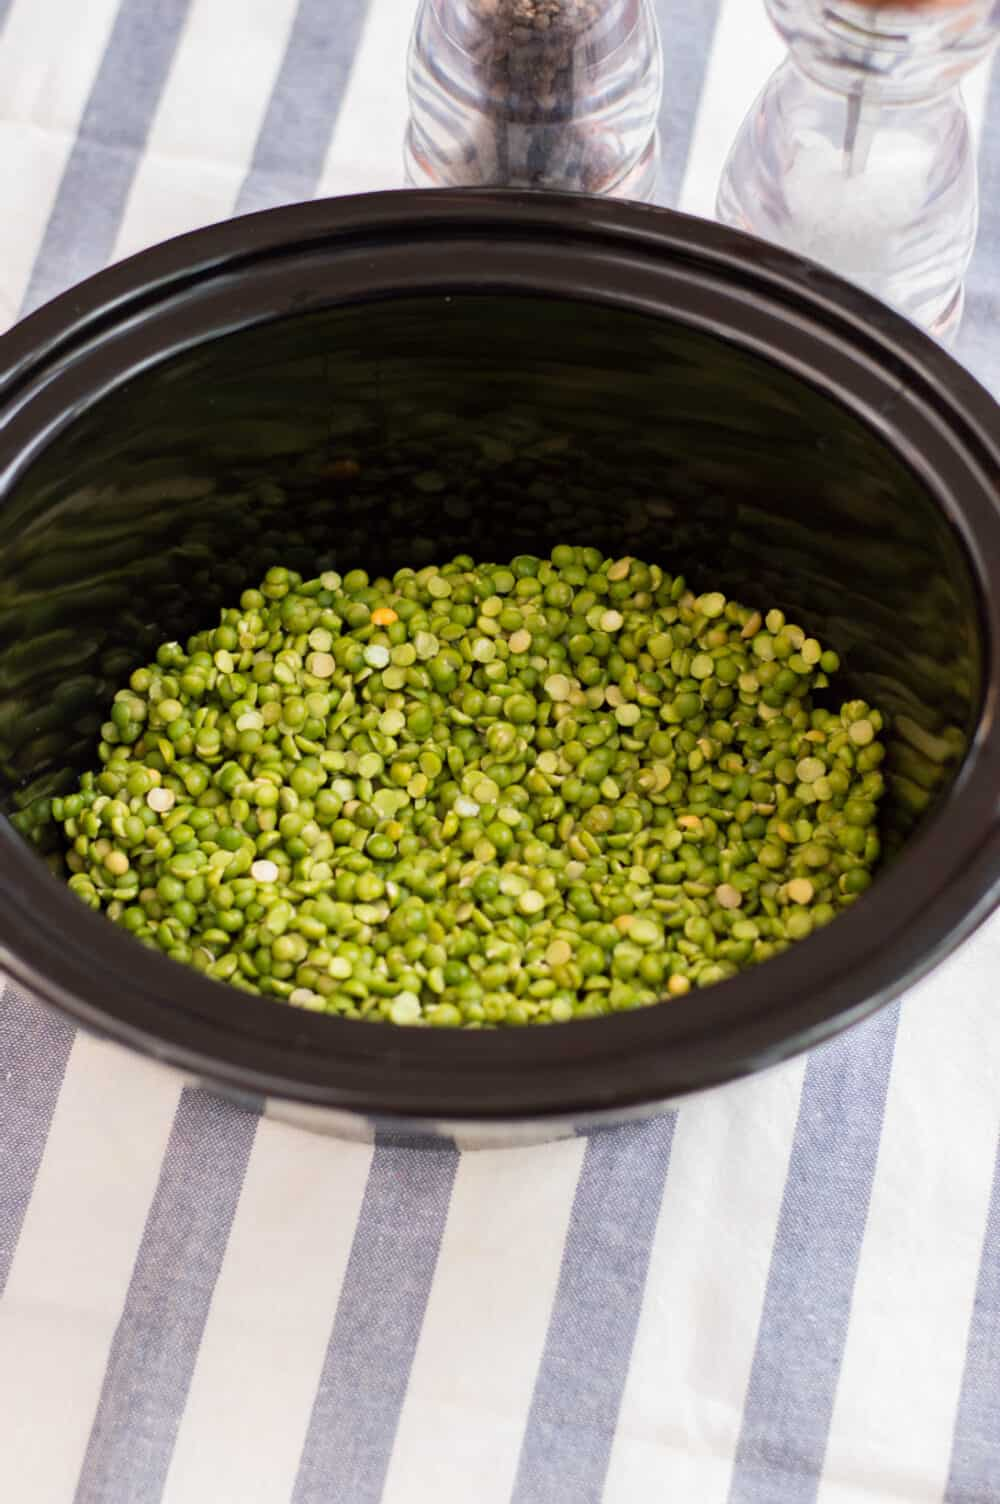 place split peas in slow cooker